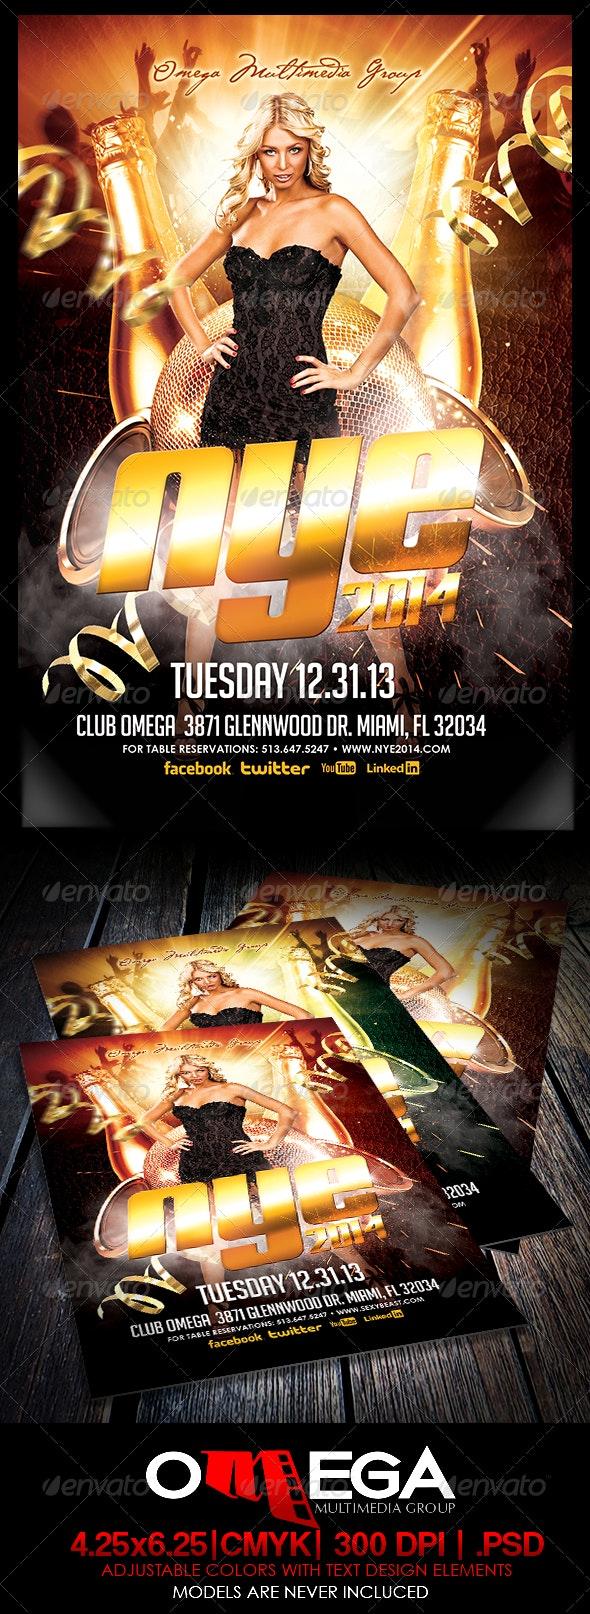 NYE 2014 - Events Flyers